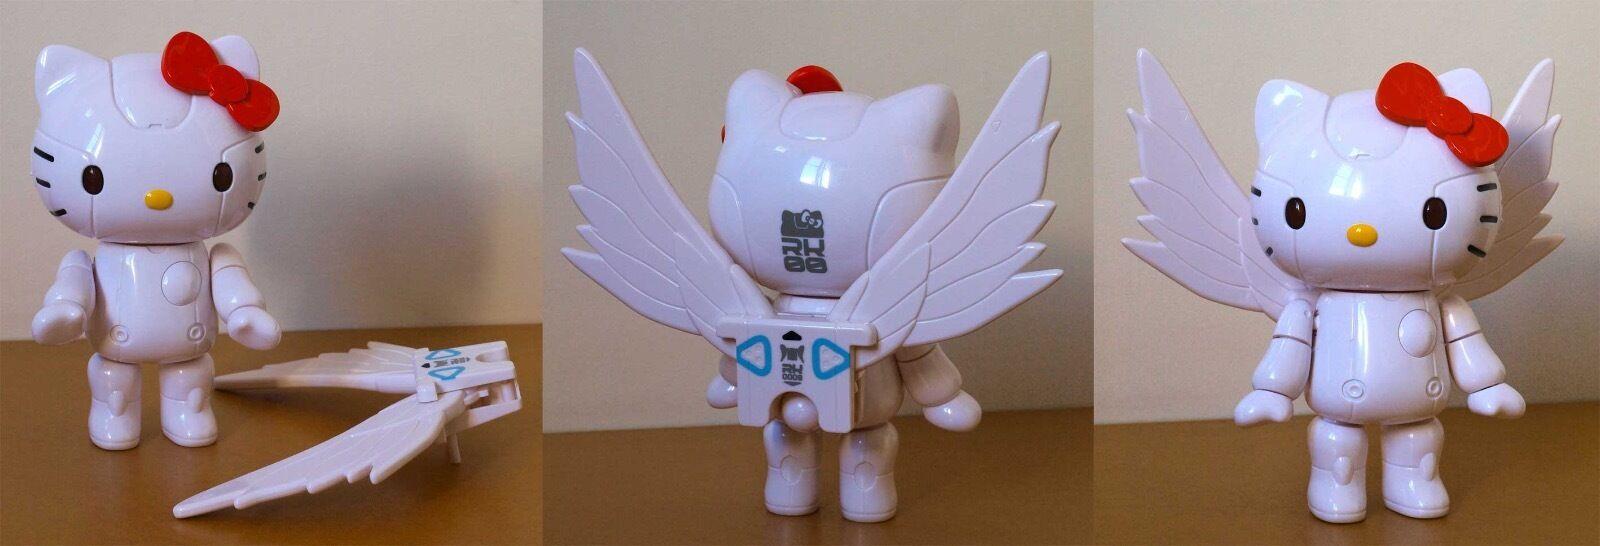 Hello Kitty Robot K Kittyrobot Sanrio Japan Collectible figure wings